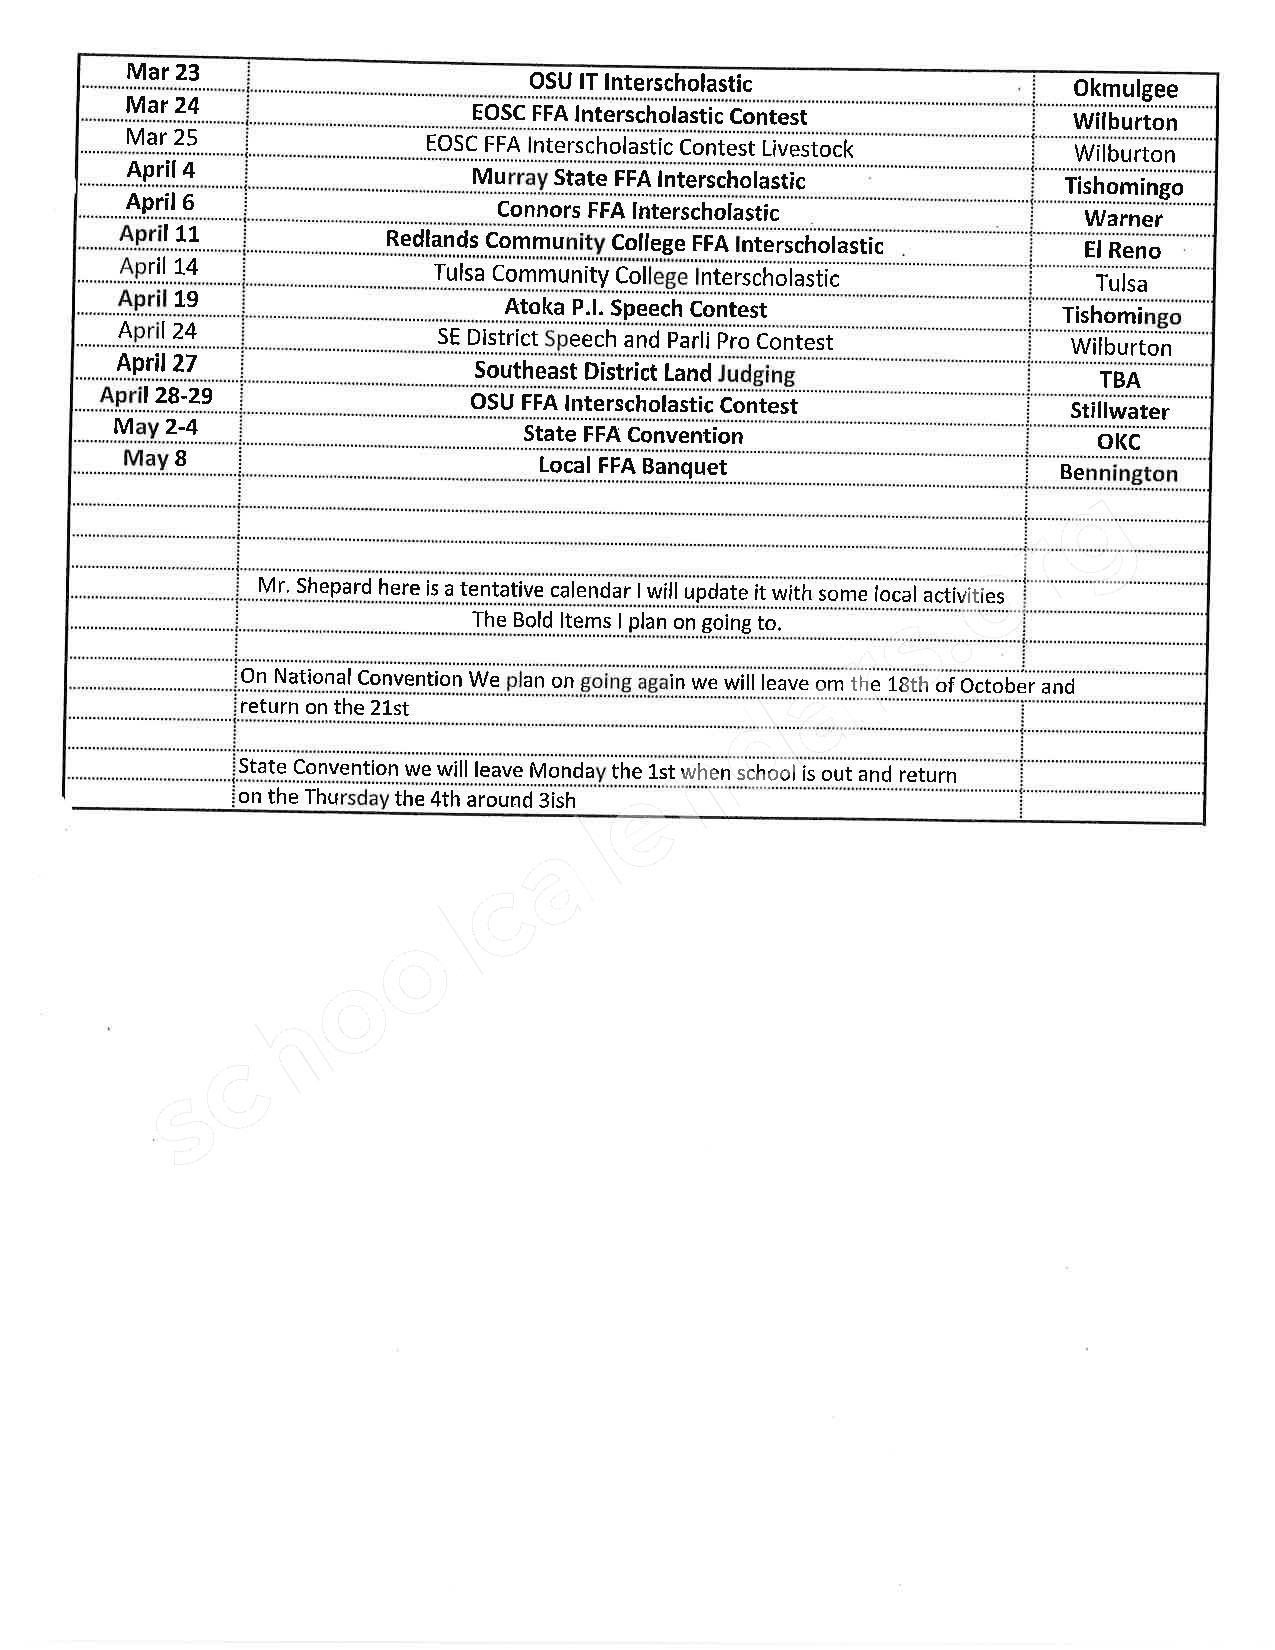 2016 - 2017 School Calendar – Bennington Elementary School – page 2